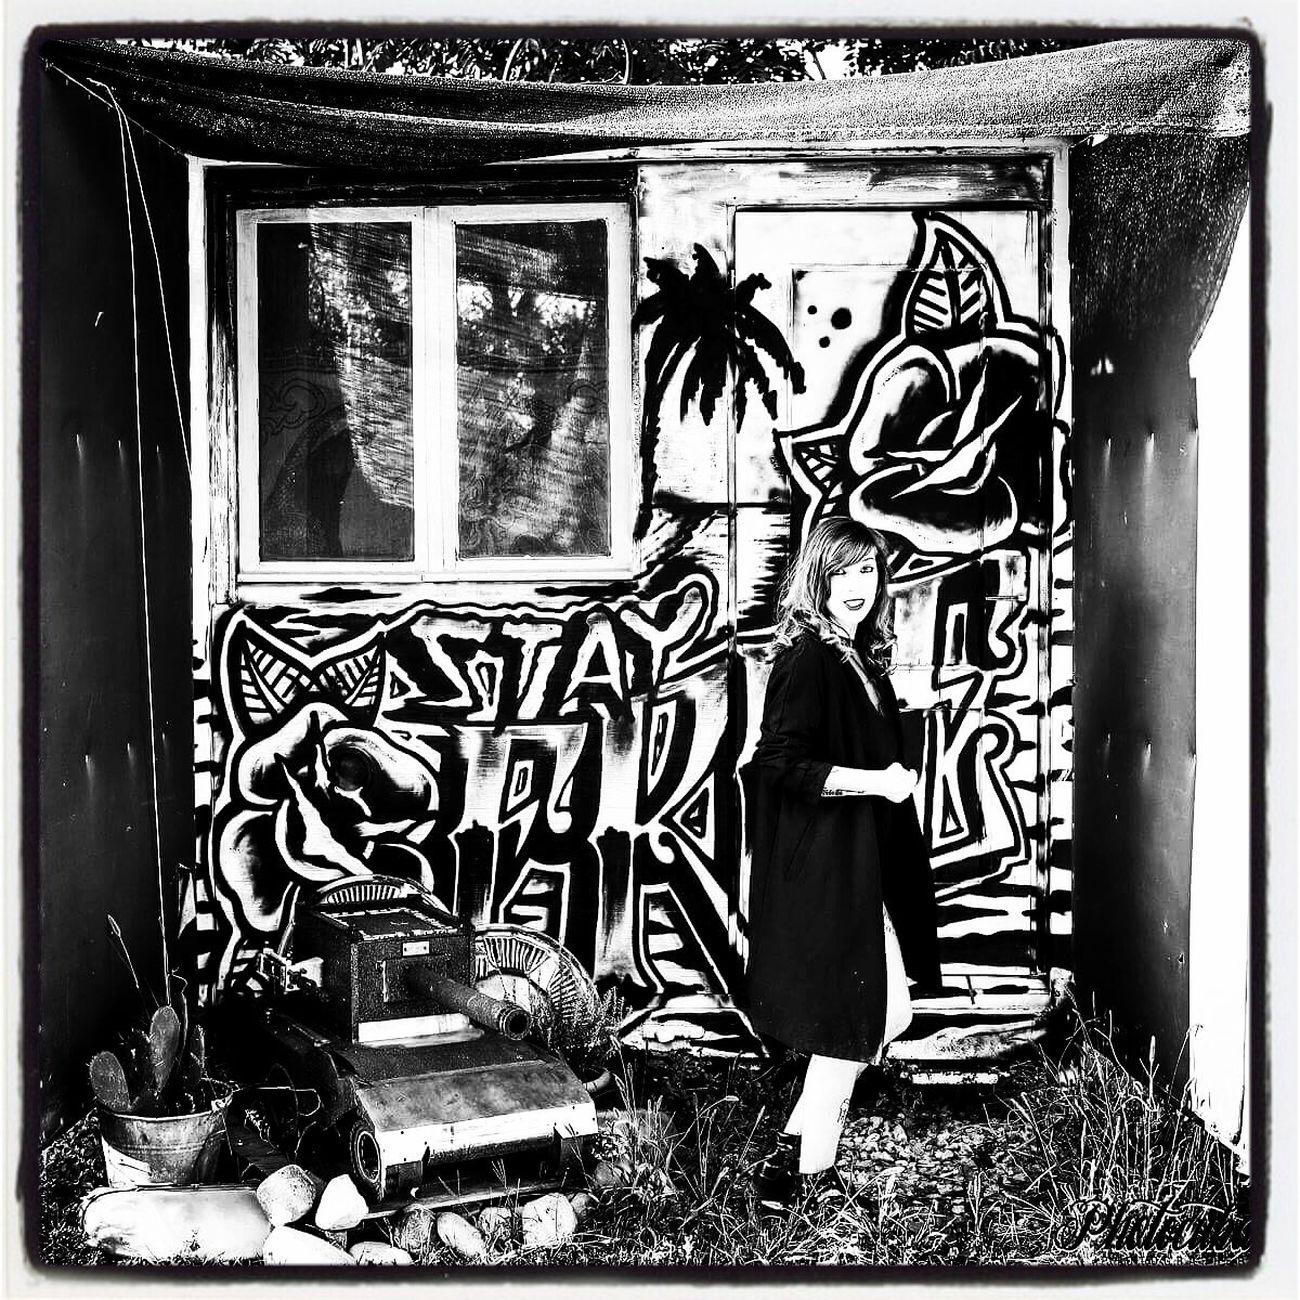 Mutoid Waste Company Mutonia Mutoid Monochrome Photography Outdoors Photo Shoot Photocuba SantarcangeloDiRomagna Inkedmodel Woman Who Inspire You Woman Portrait Artphotography Real People Graffiti Murales Art Arte Urbano  Black And White Contrast And Lights Photooftheday Alternative Girls Model Shoot Punk Style Nero Black & White